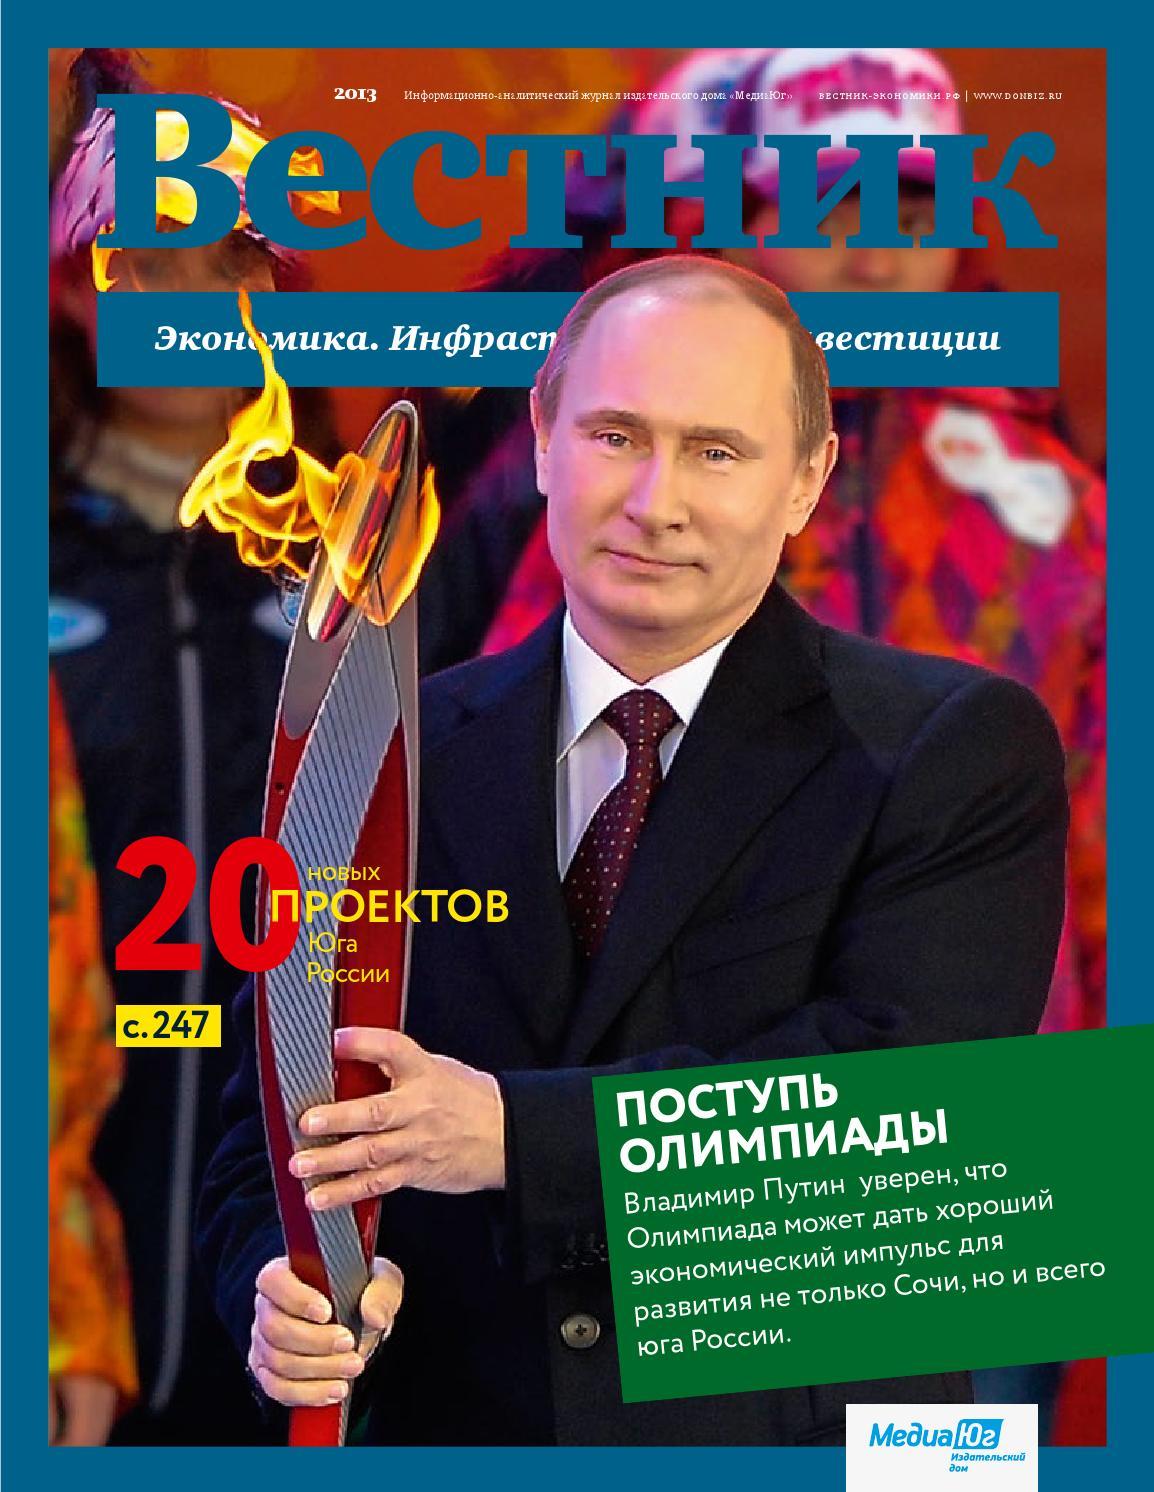 Юрий гребенников 52 телец россия москва на сайте знакомства брачные знакомства с иностранцем бесплатно